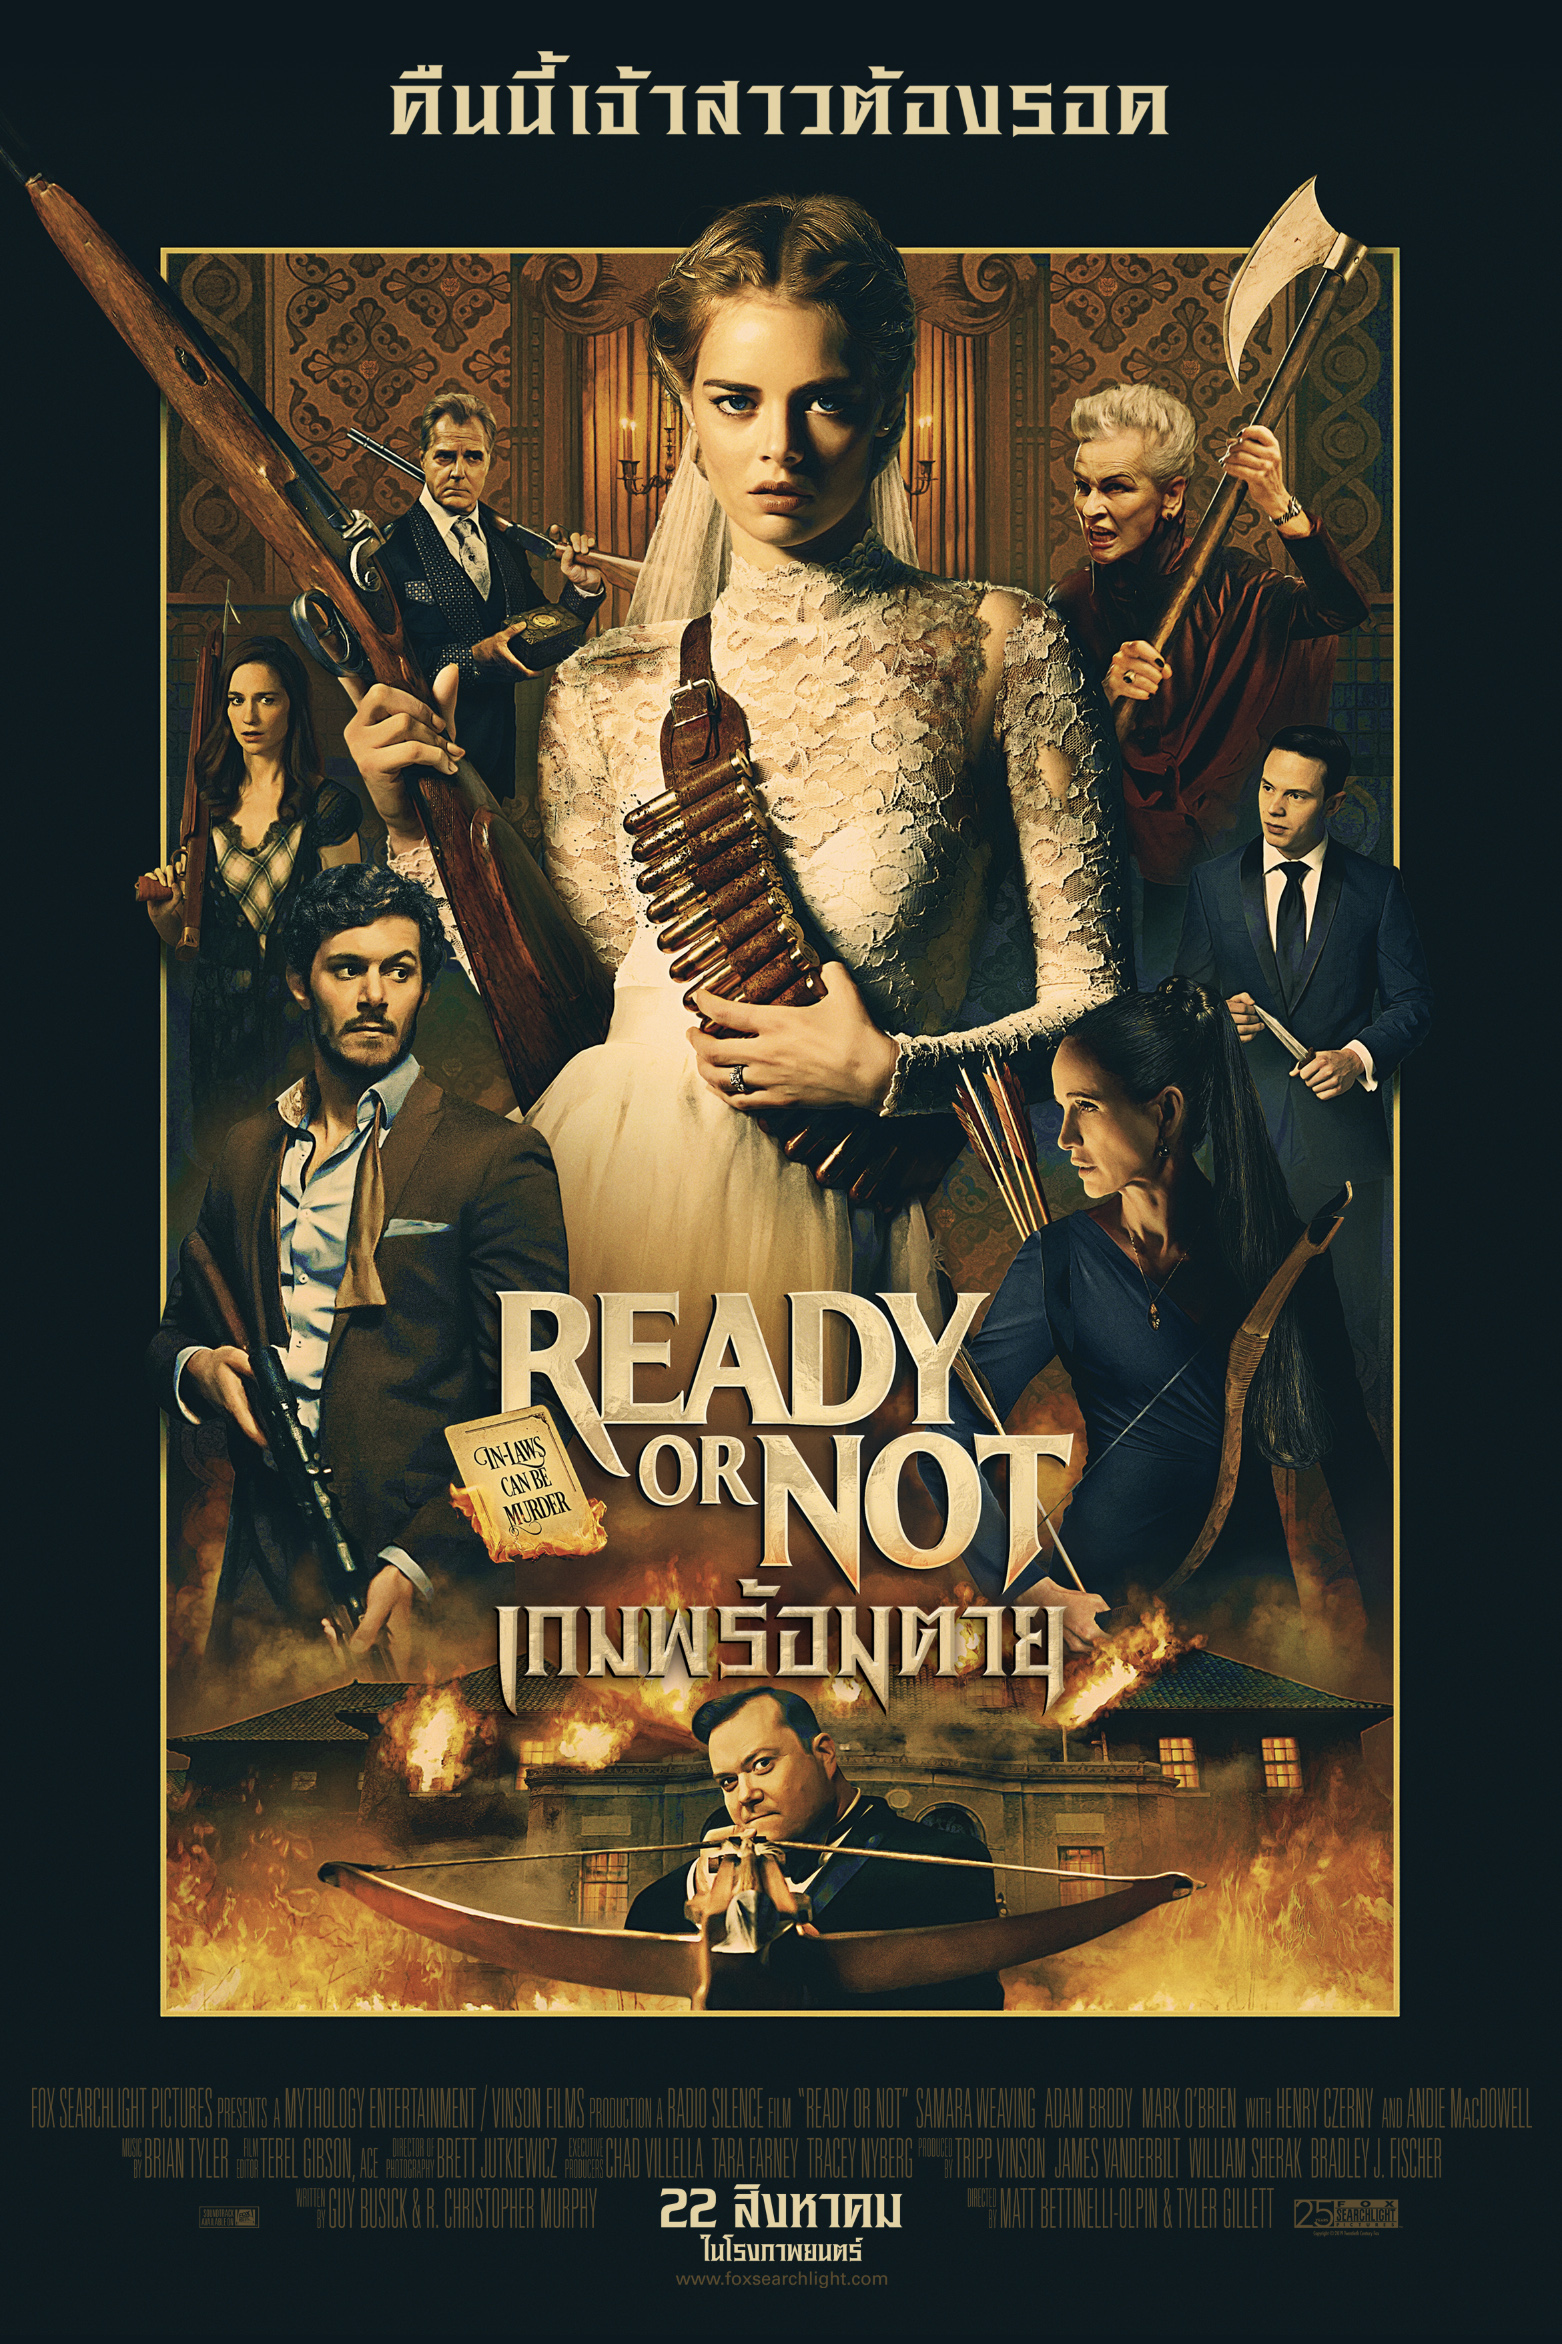 RON International Thailand Poster 3.jpg